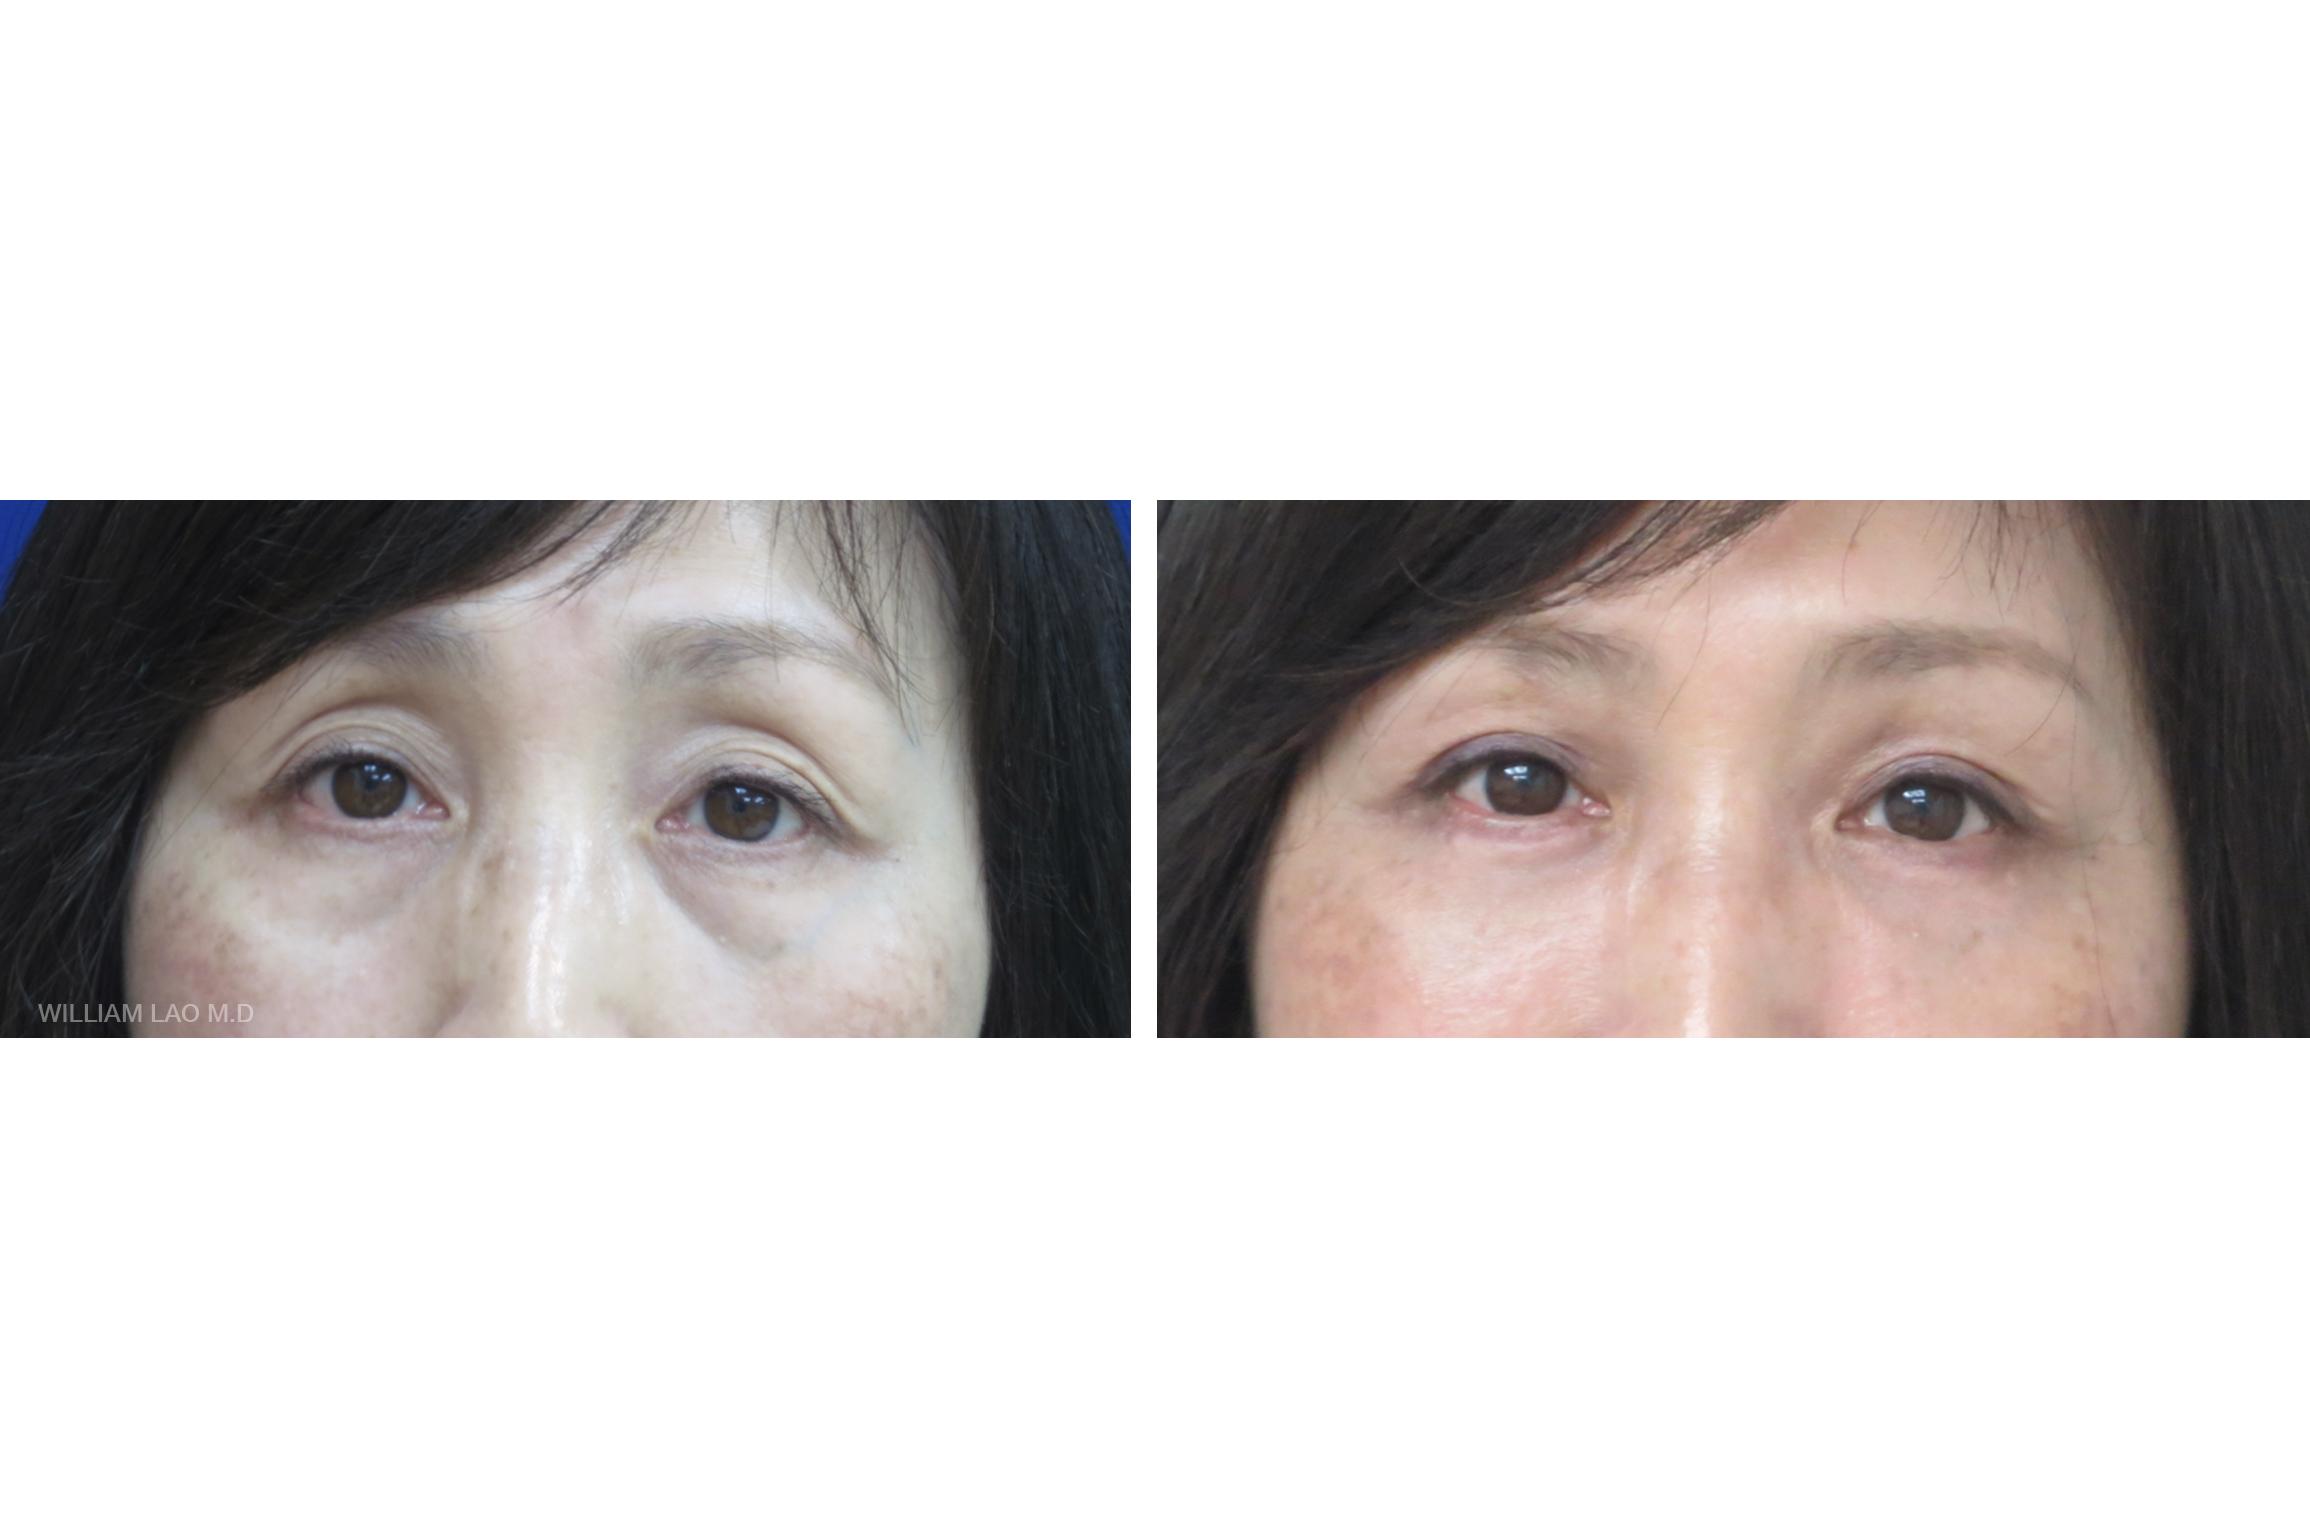 H,55 歲,亞裔   H小姐從年輕時就有多層的上眼皮,後來因為年紀大了加上眼眶脂肪流失,多層的眼皮更明顯,加上眼袋的形成讓整個人顯得更蒼老憔悴。 進行上下眼皮手術後,兩眼突出的眼袋和多餘的眼皮都不見了,整個人看起來年輕多了。   瞭解更多